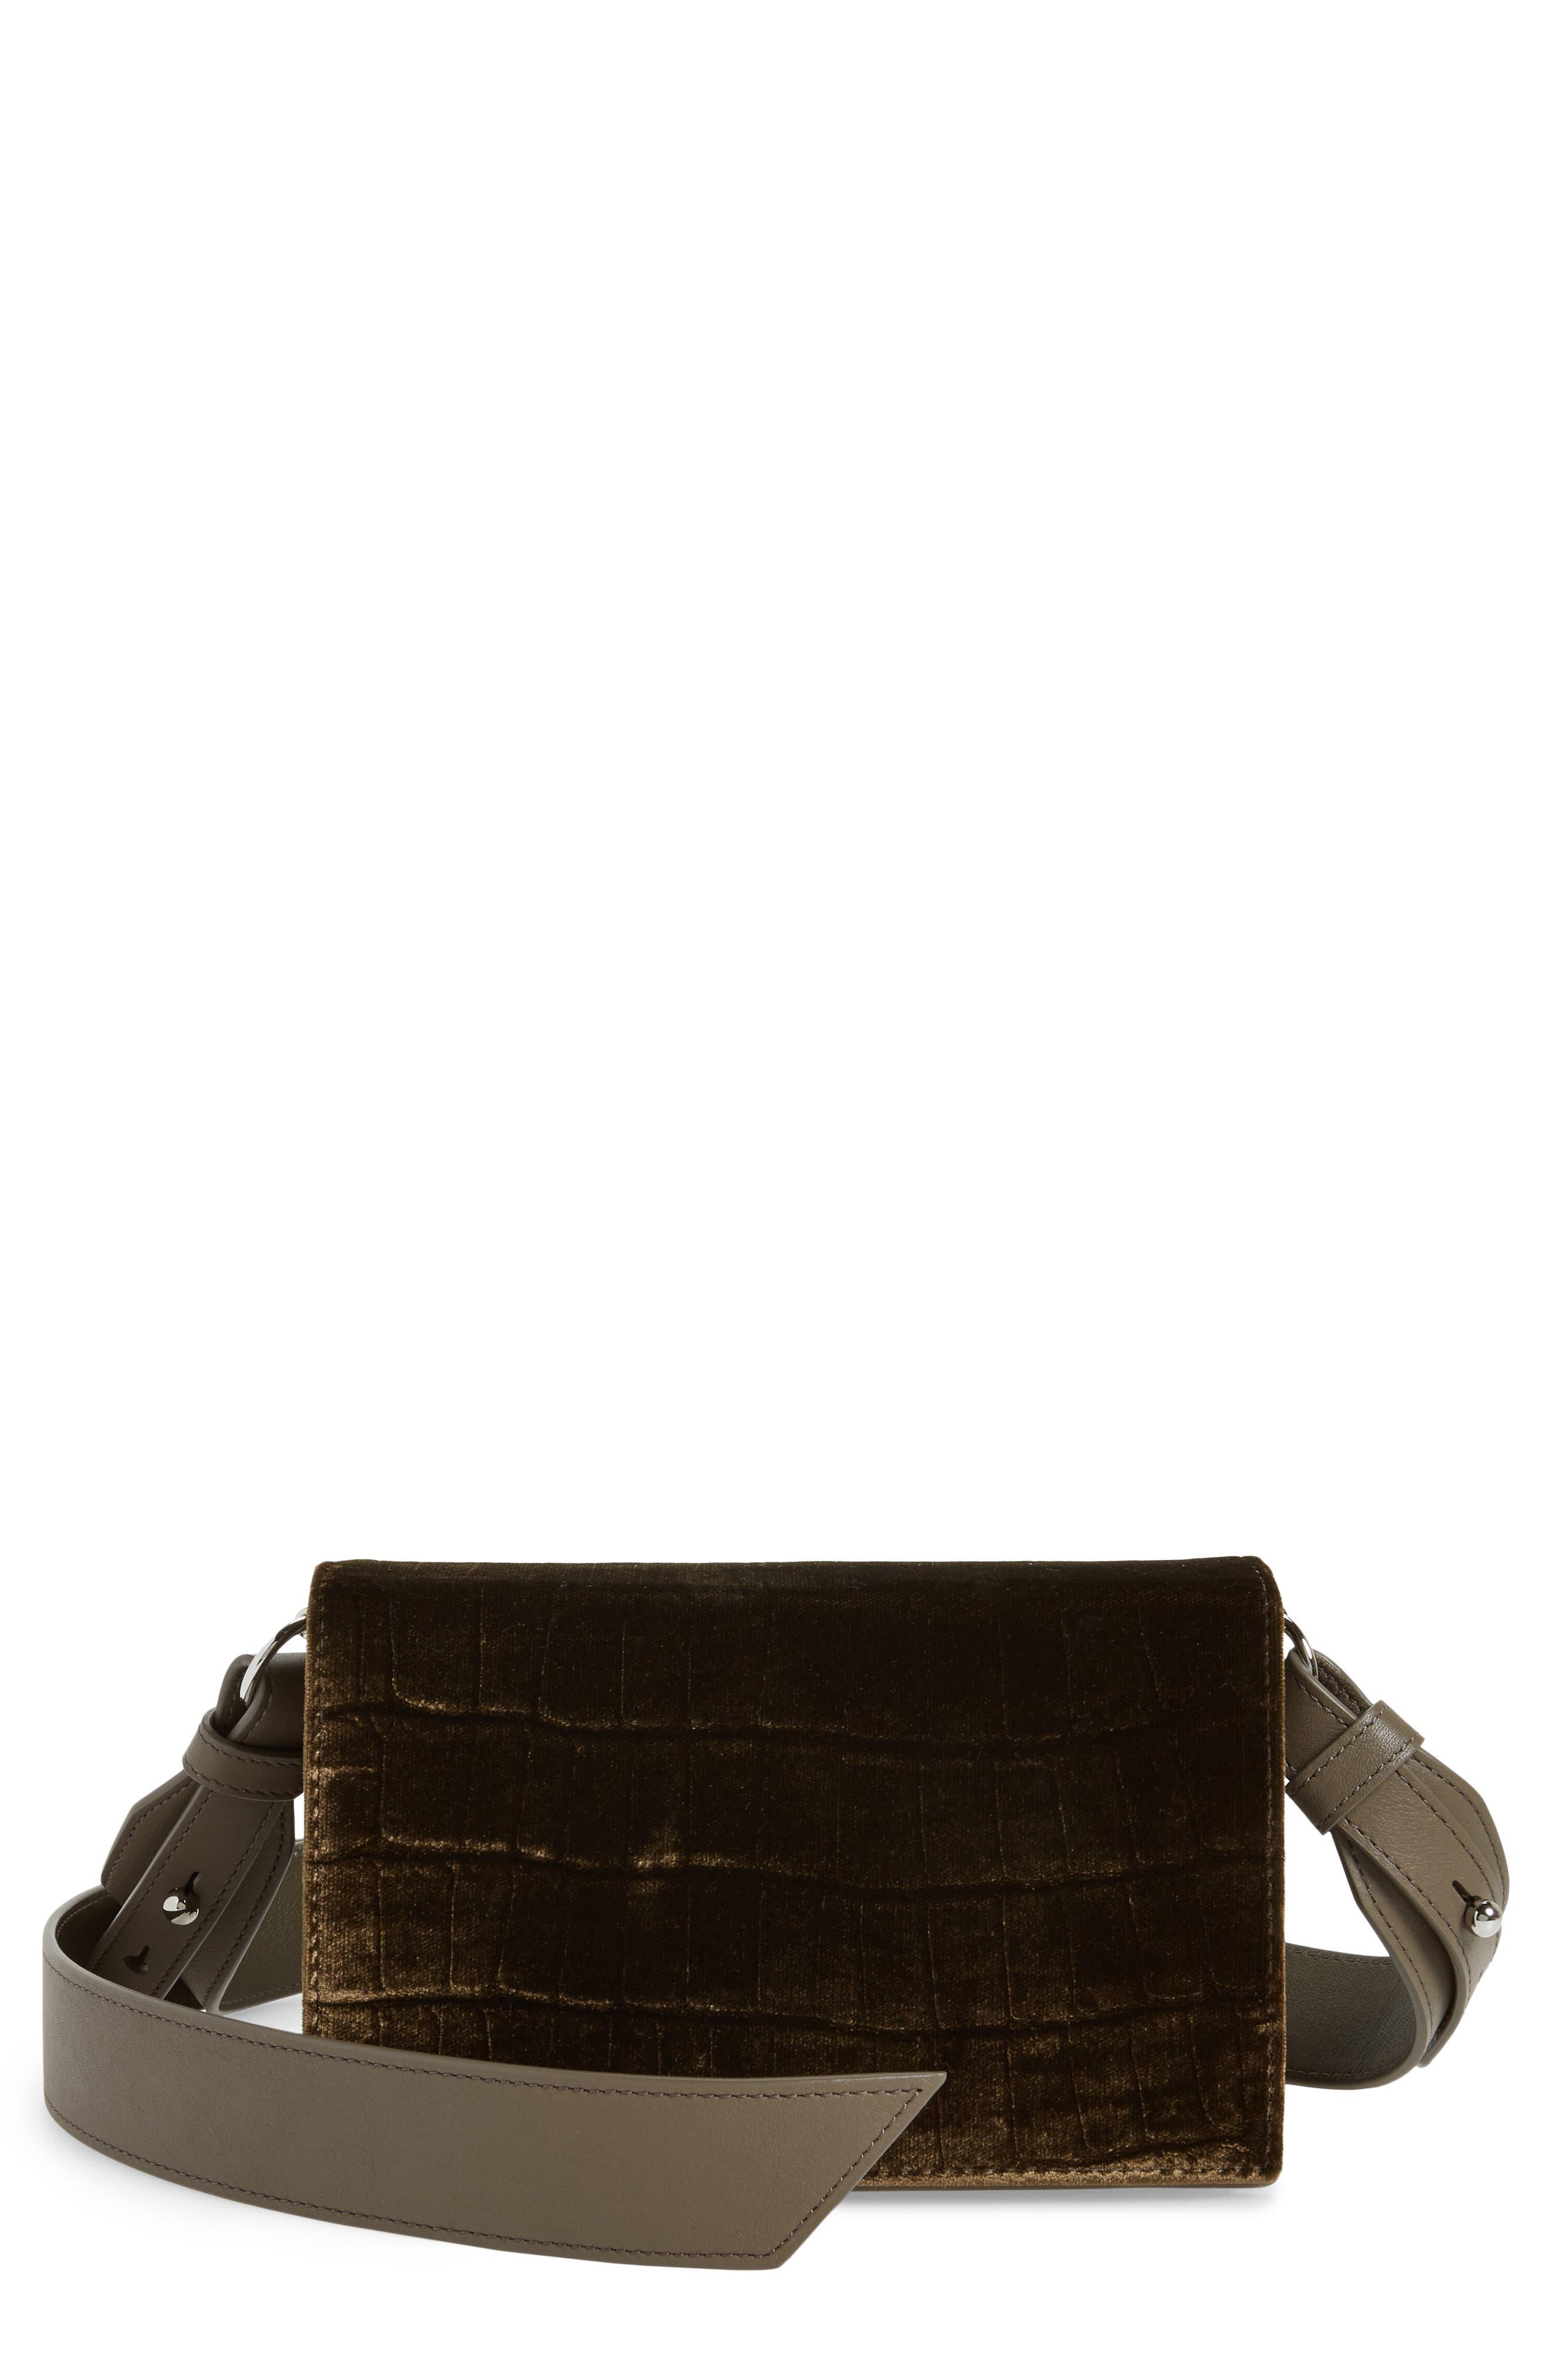 Keel Shoulder Bag,                             Main thumbnail 1, color,                             024